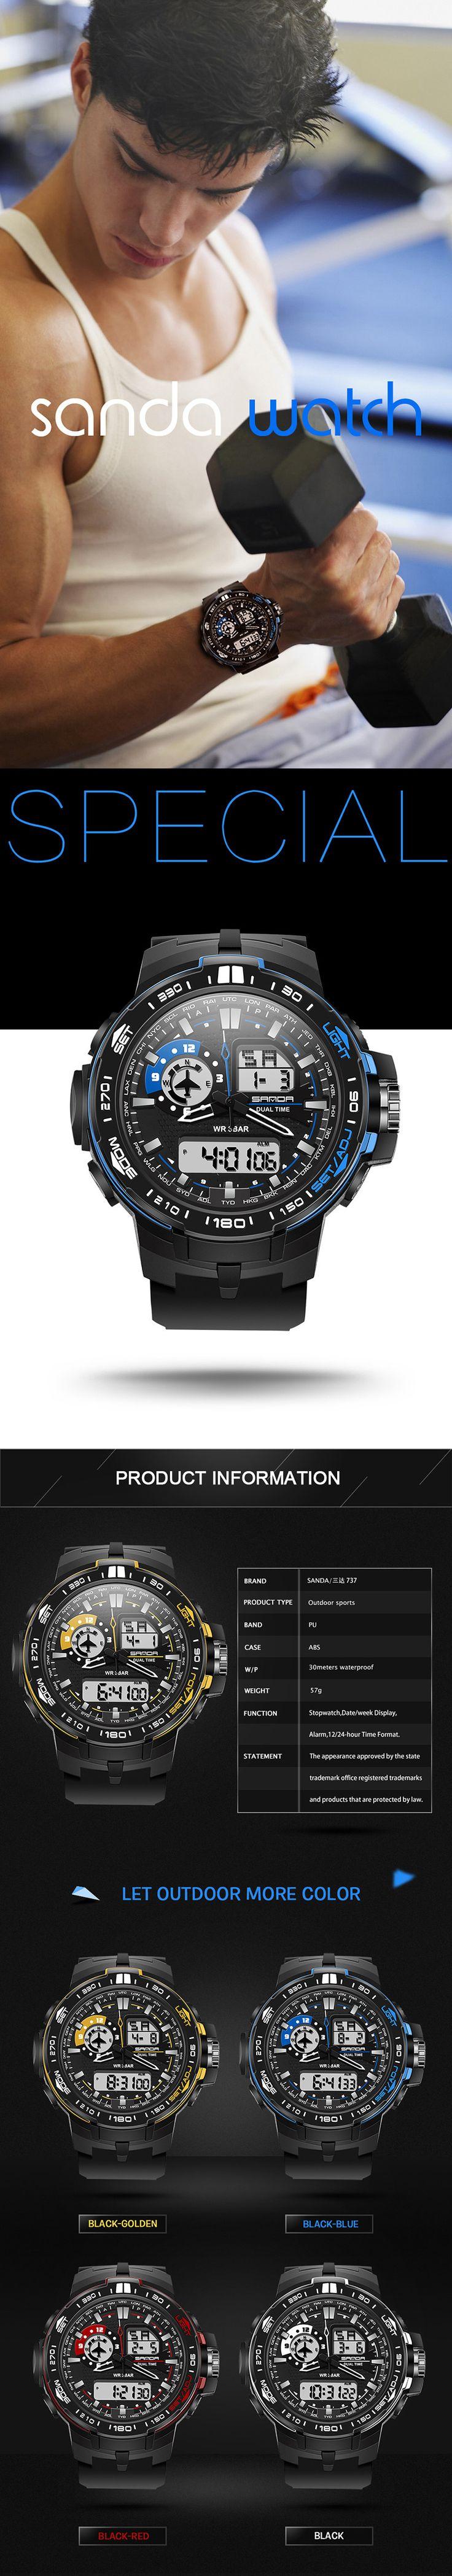 SANDA 737 Fashion Men Dual Display Watch PU Resin Strap Multifunction Sport Watch